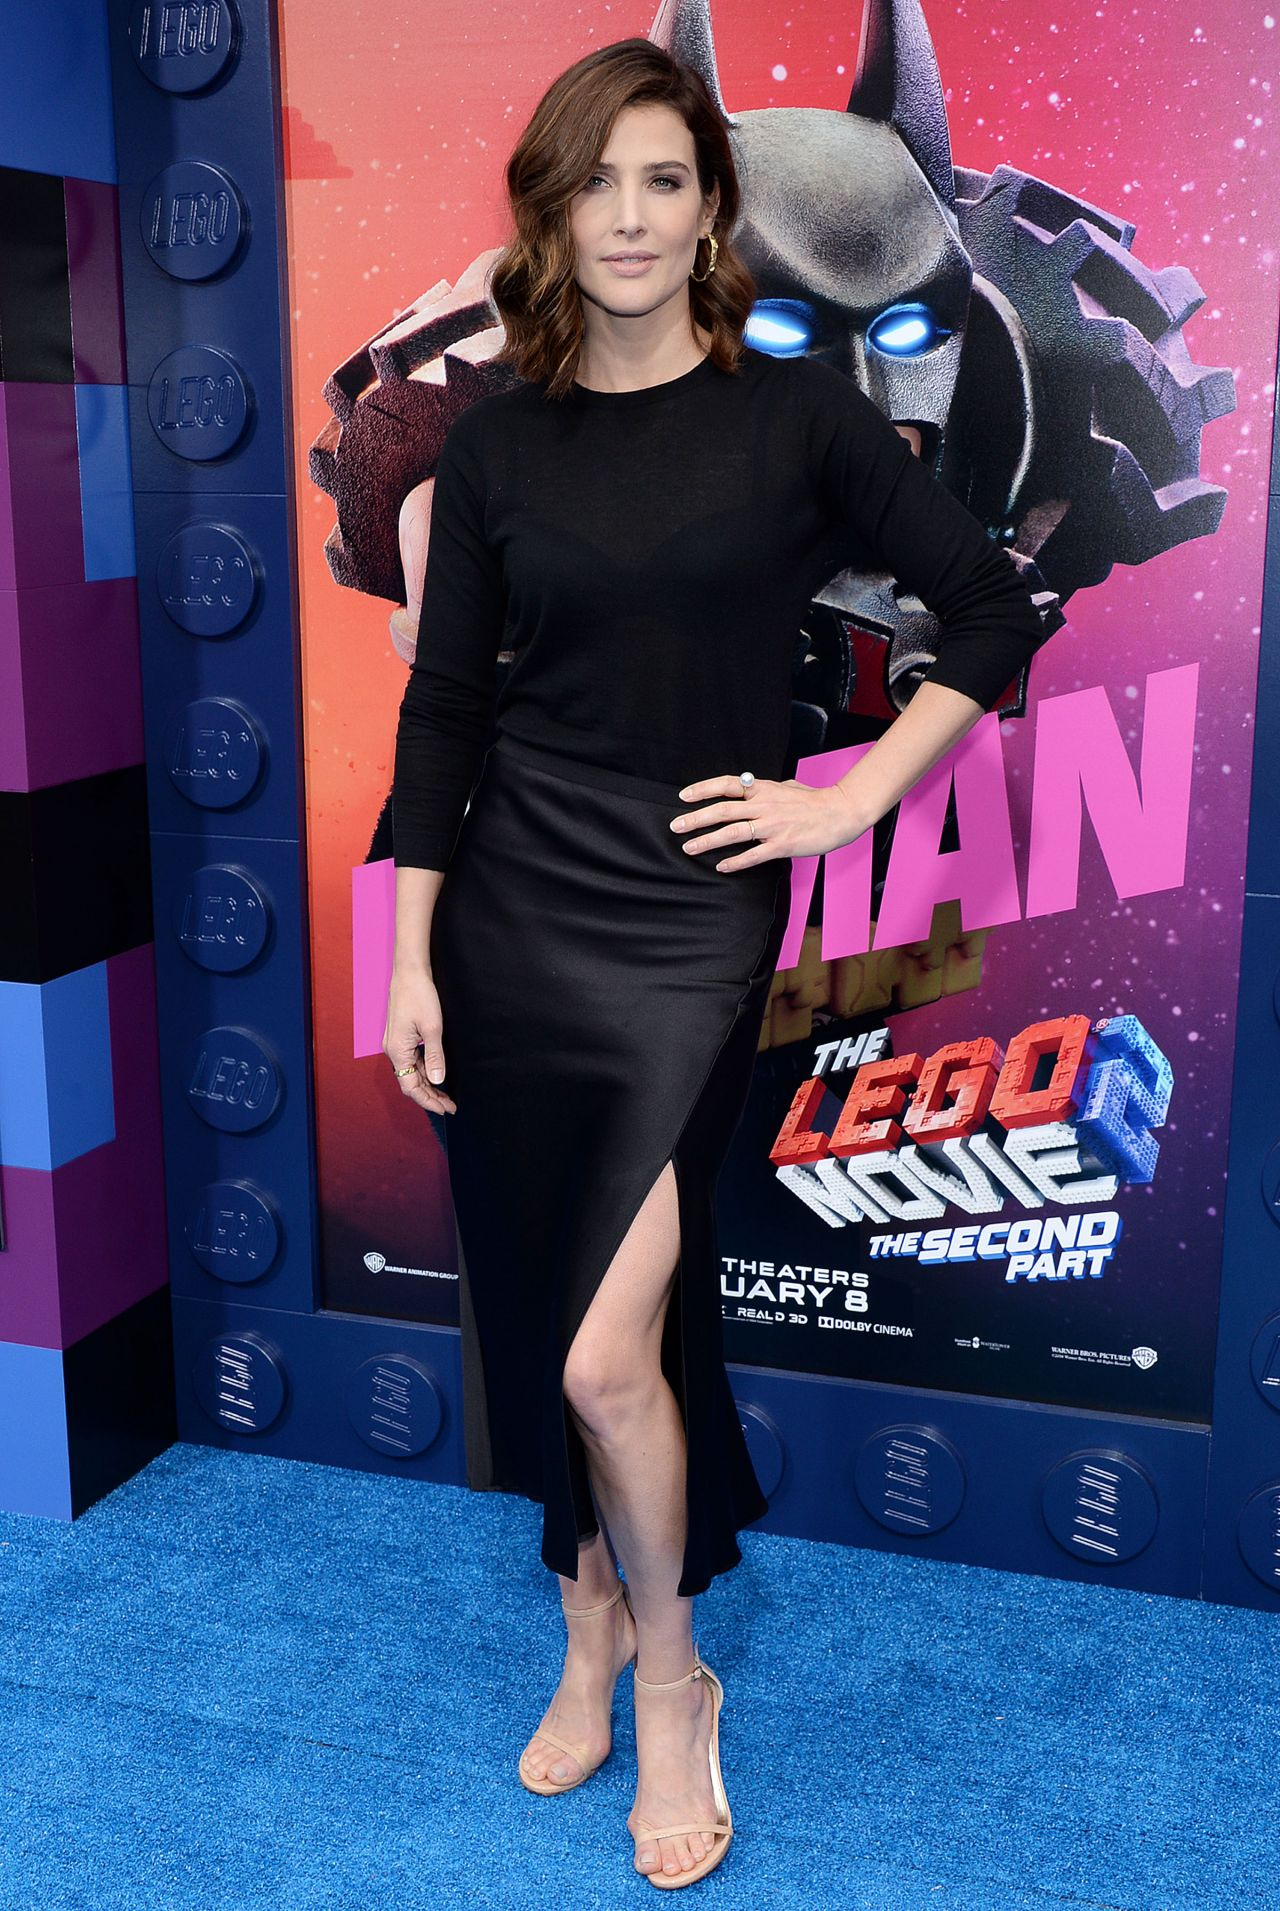 https://celebmafia.com/wp-content/uploads/2019/02/cobie-smulders-the-lego-movie-2-the-second-part-premiere-in-london-15.jpg